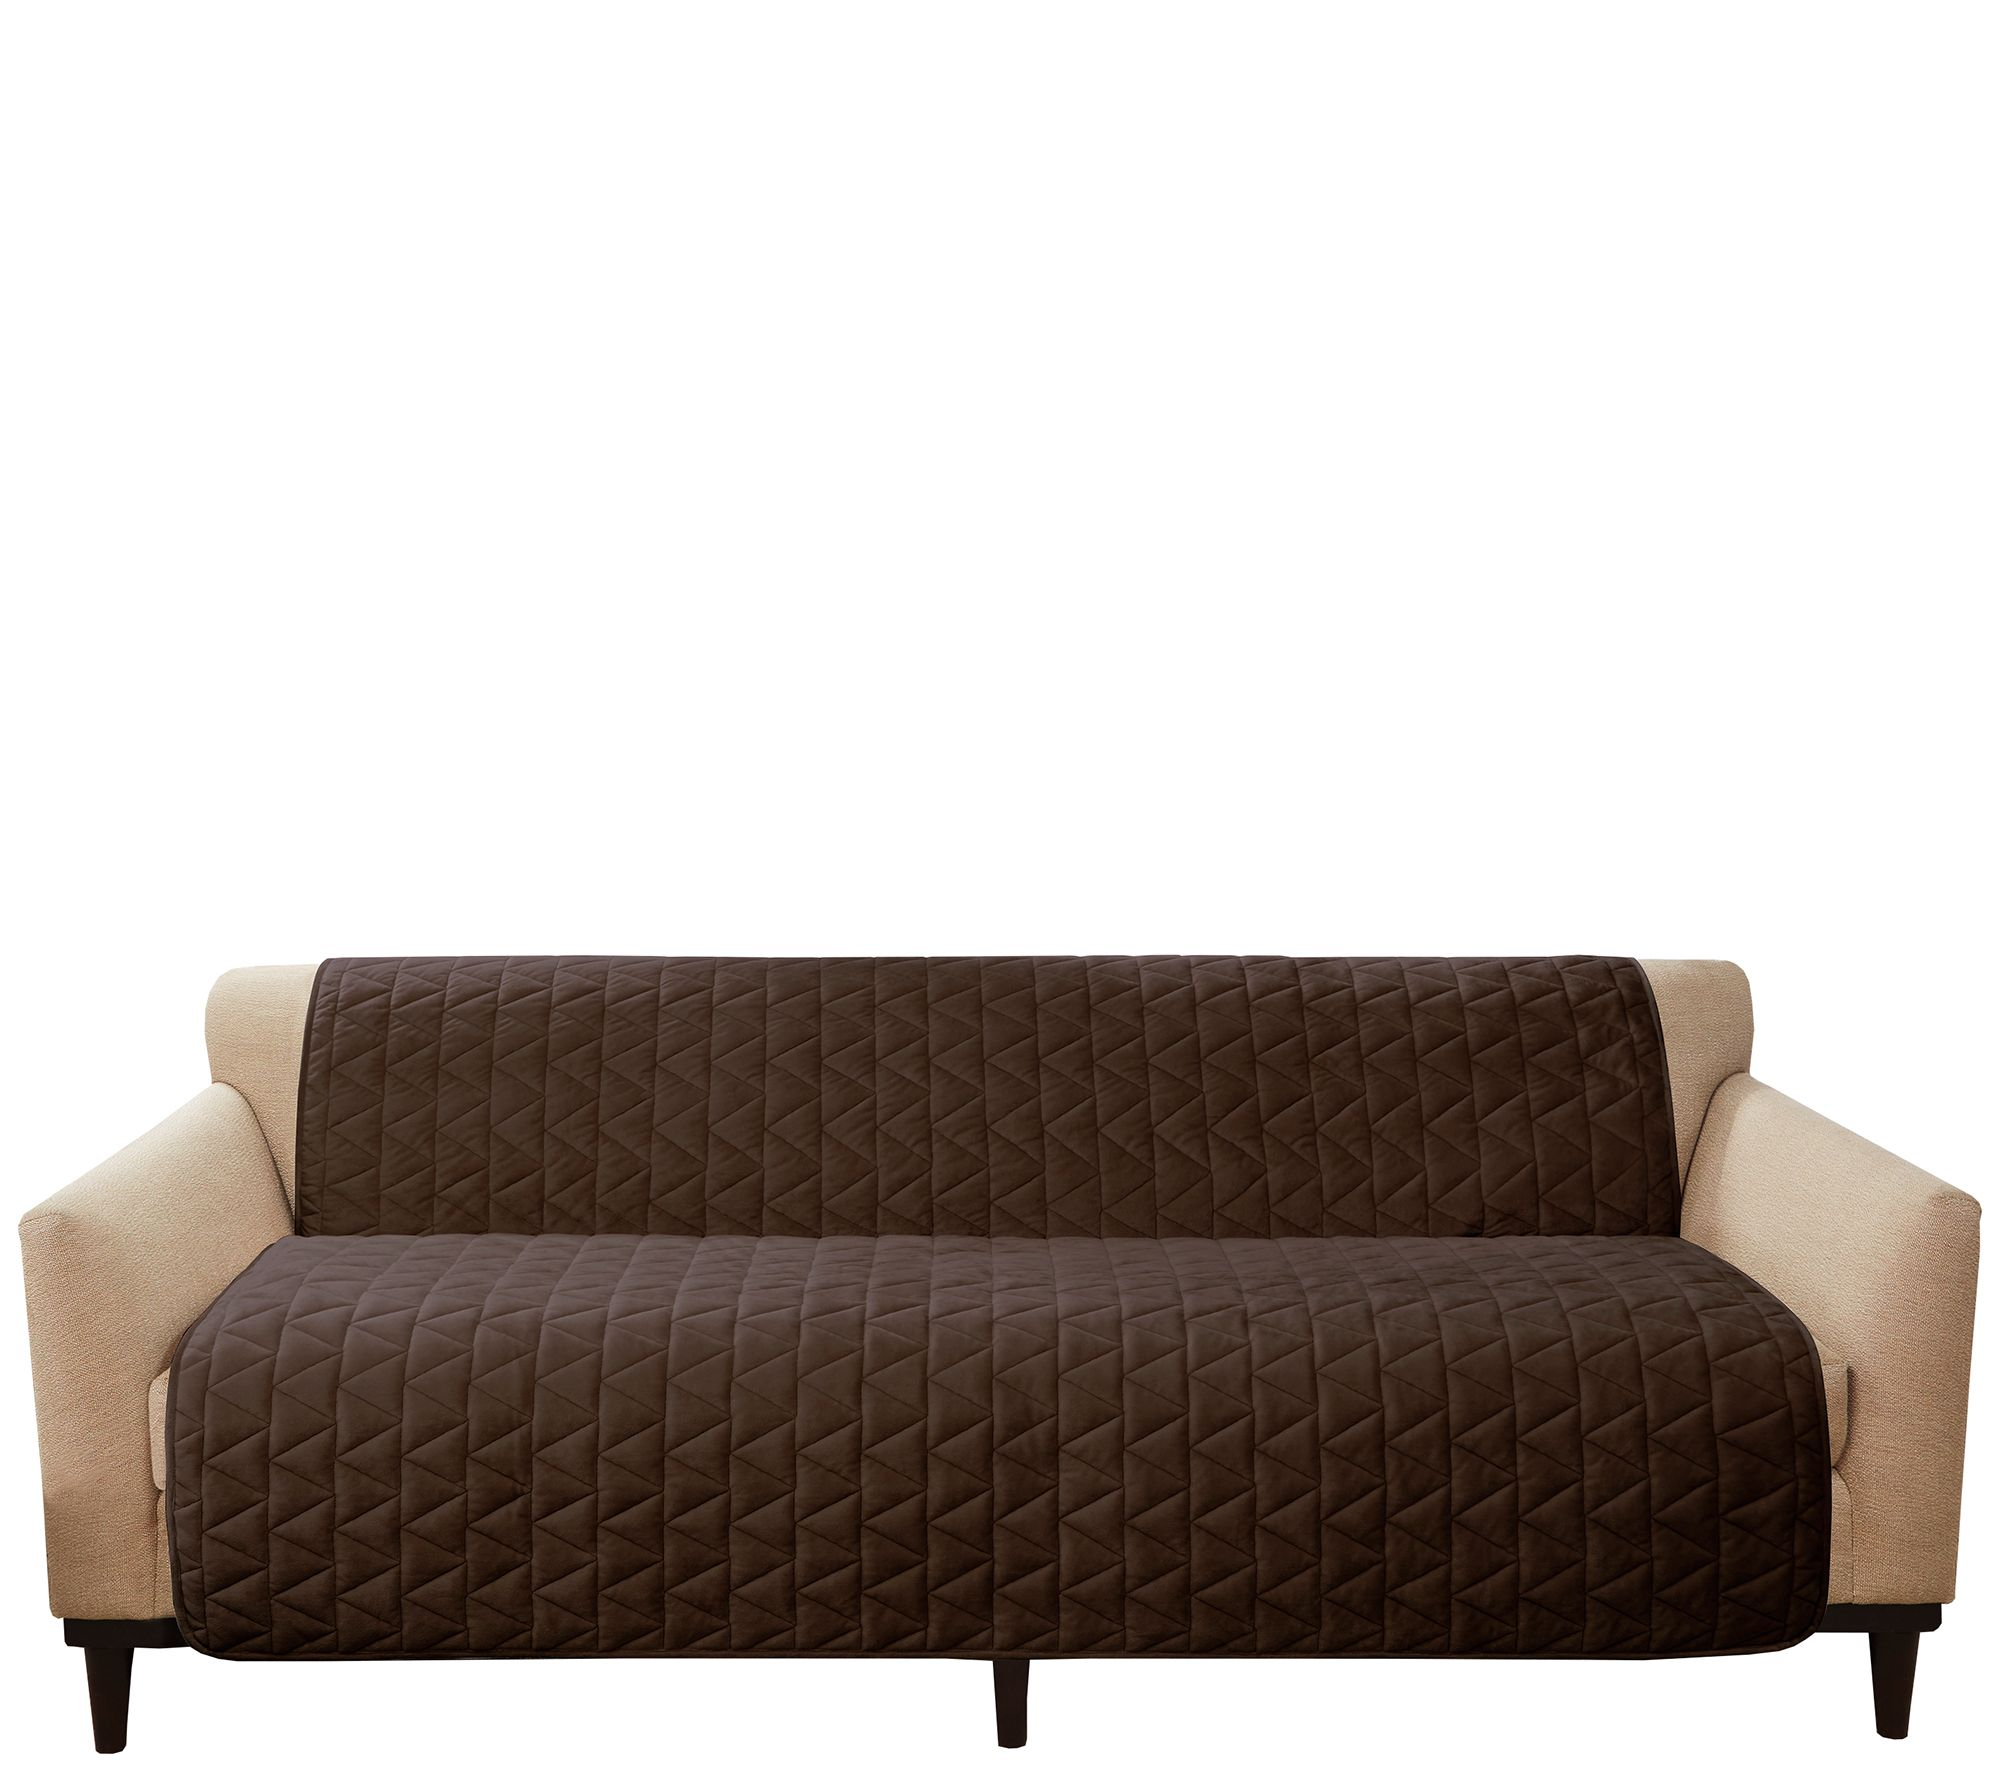 SureFit Deluxe Waterproof Armless Sofa & Sectional